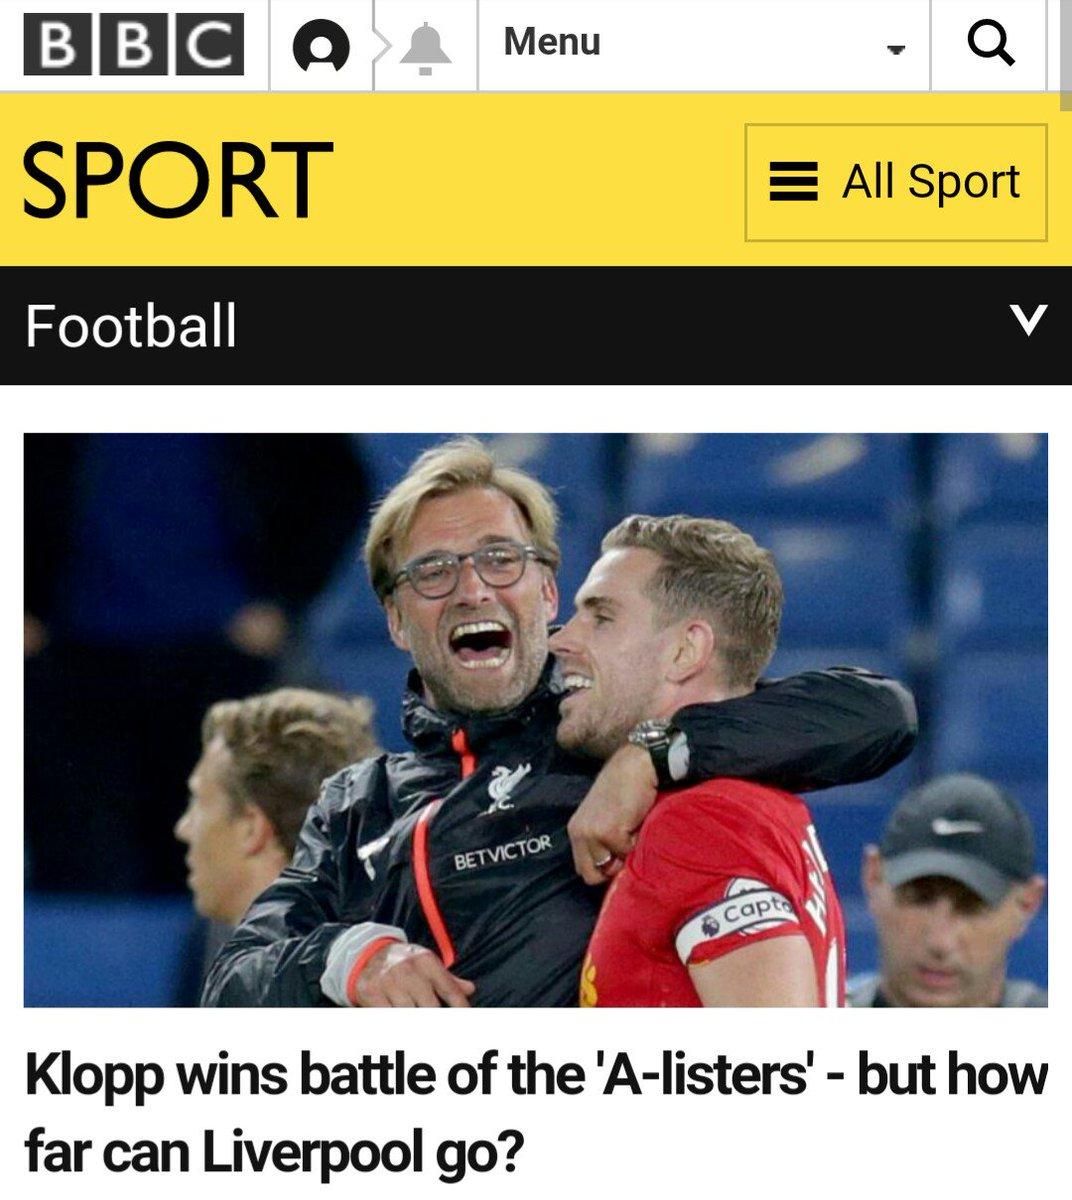 BBC Sport on Twitter: